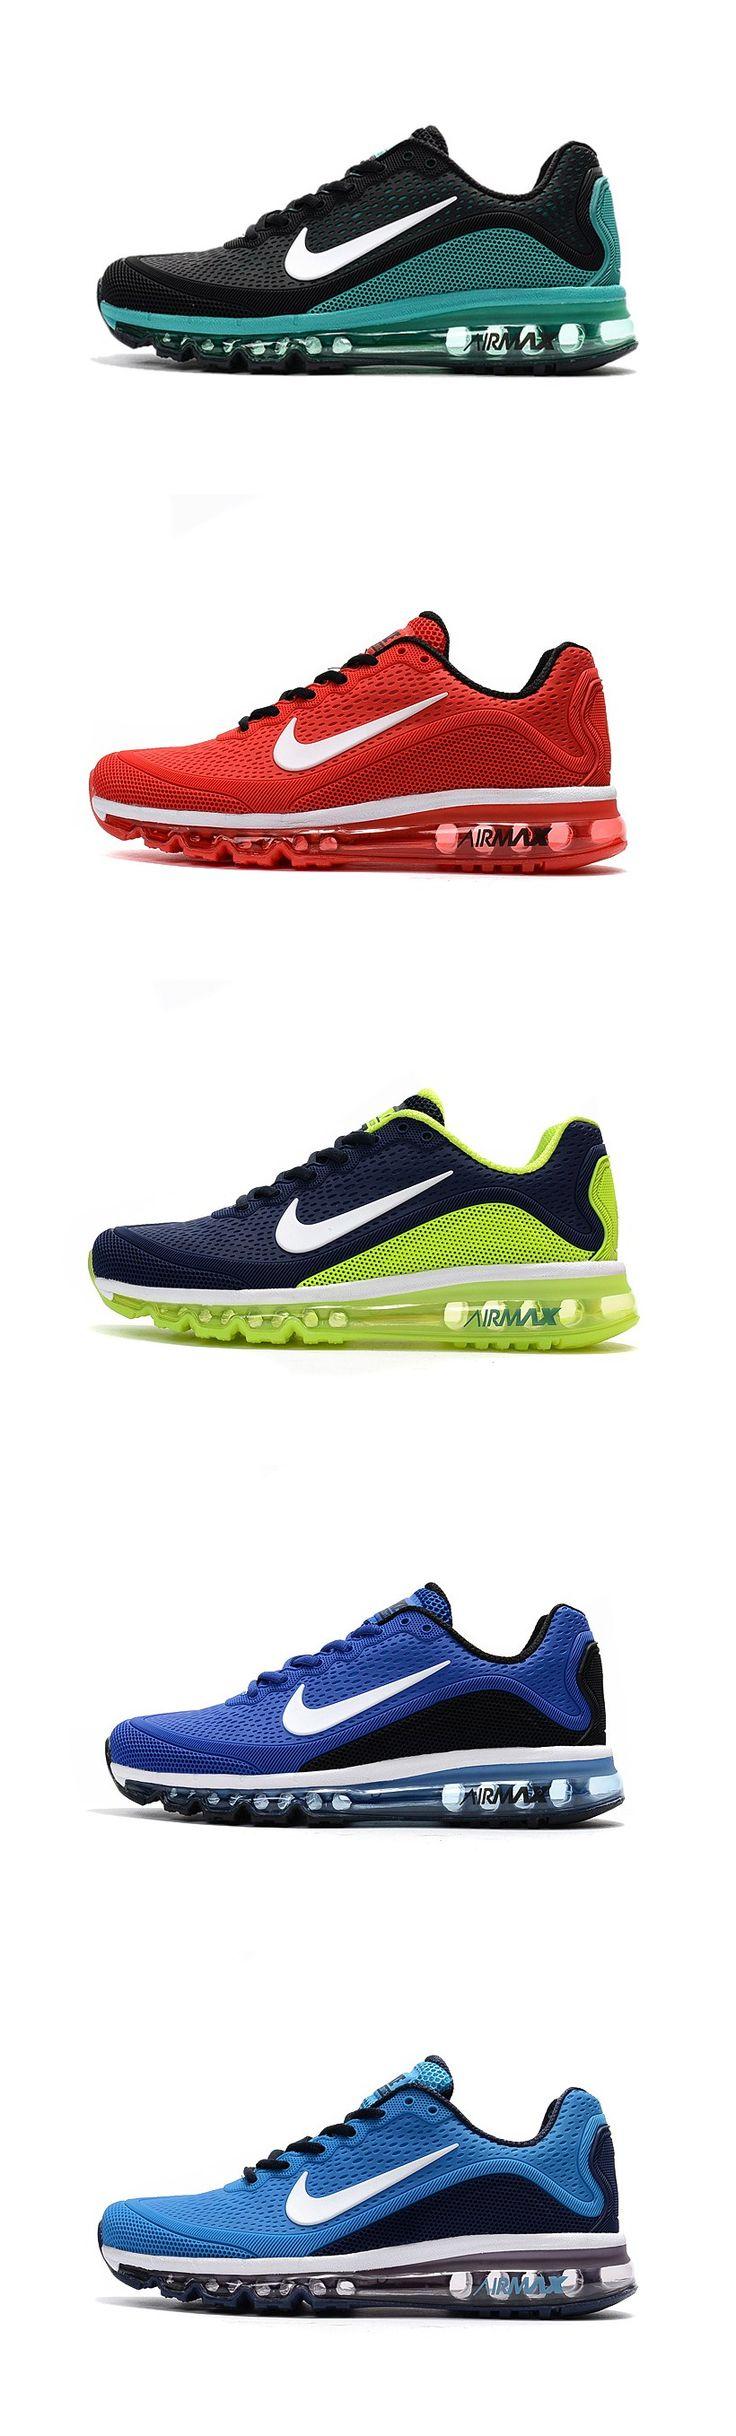 Cheap Nike Air Max 2017.5 KPU Men shoes Free Shipping Jade Dark Blue,Red,